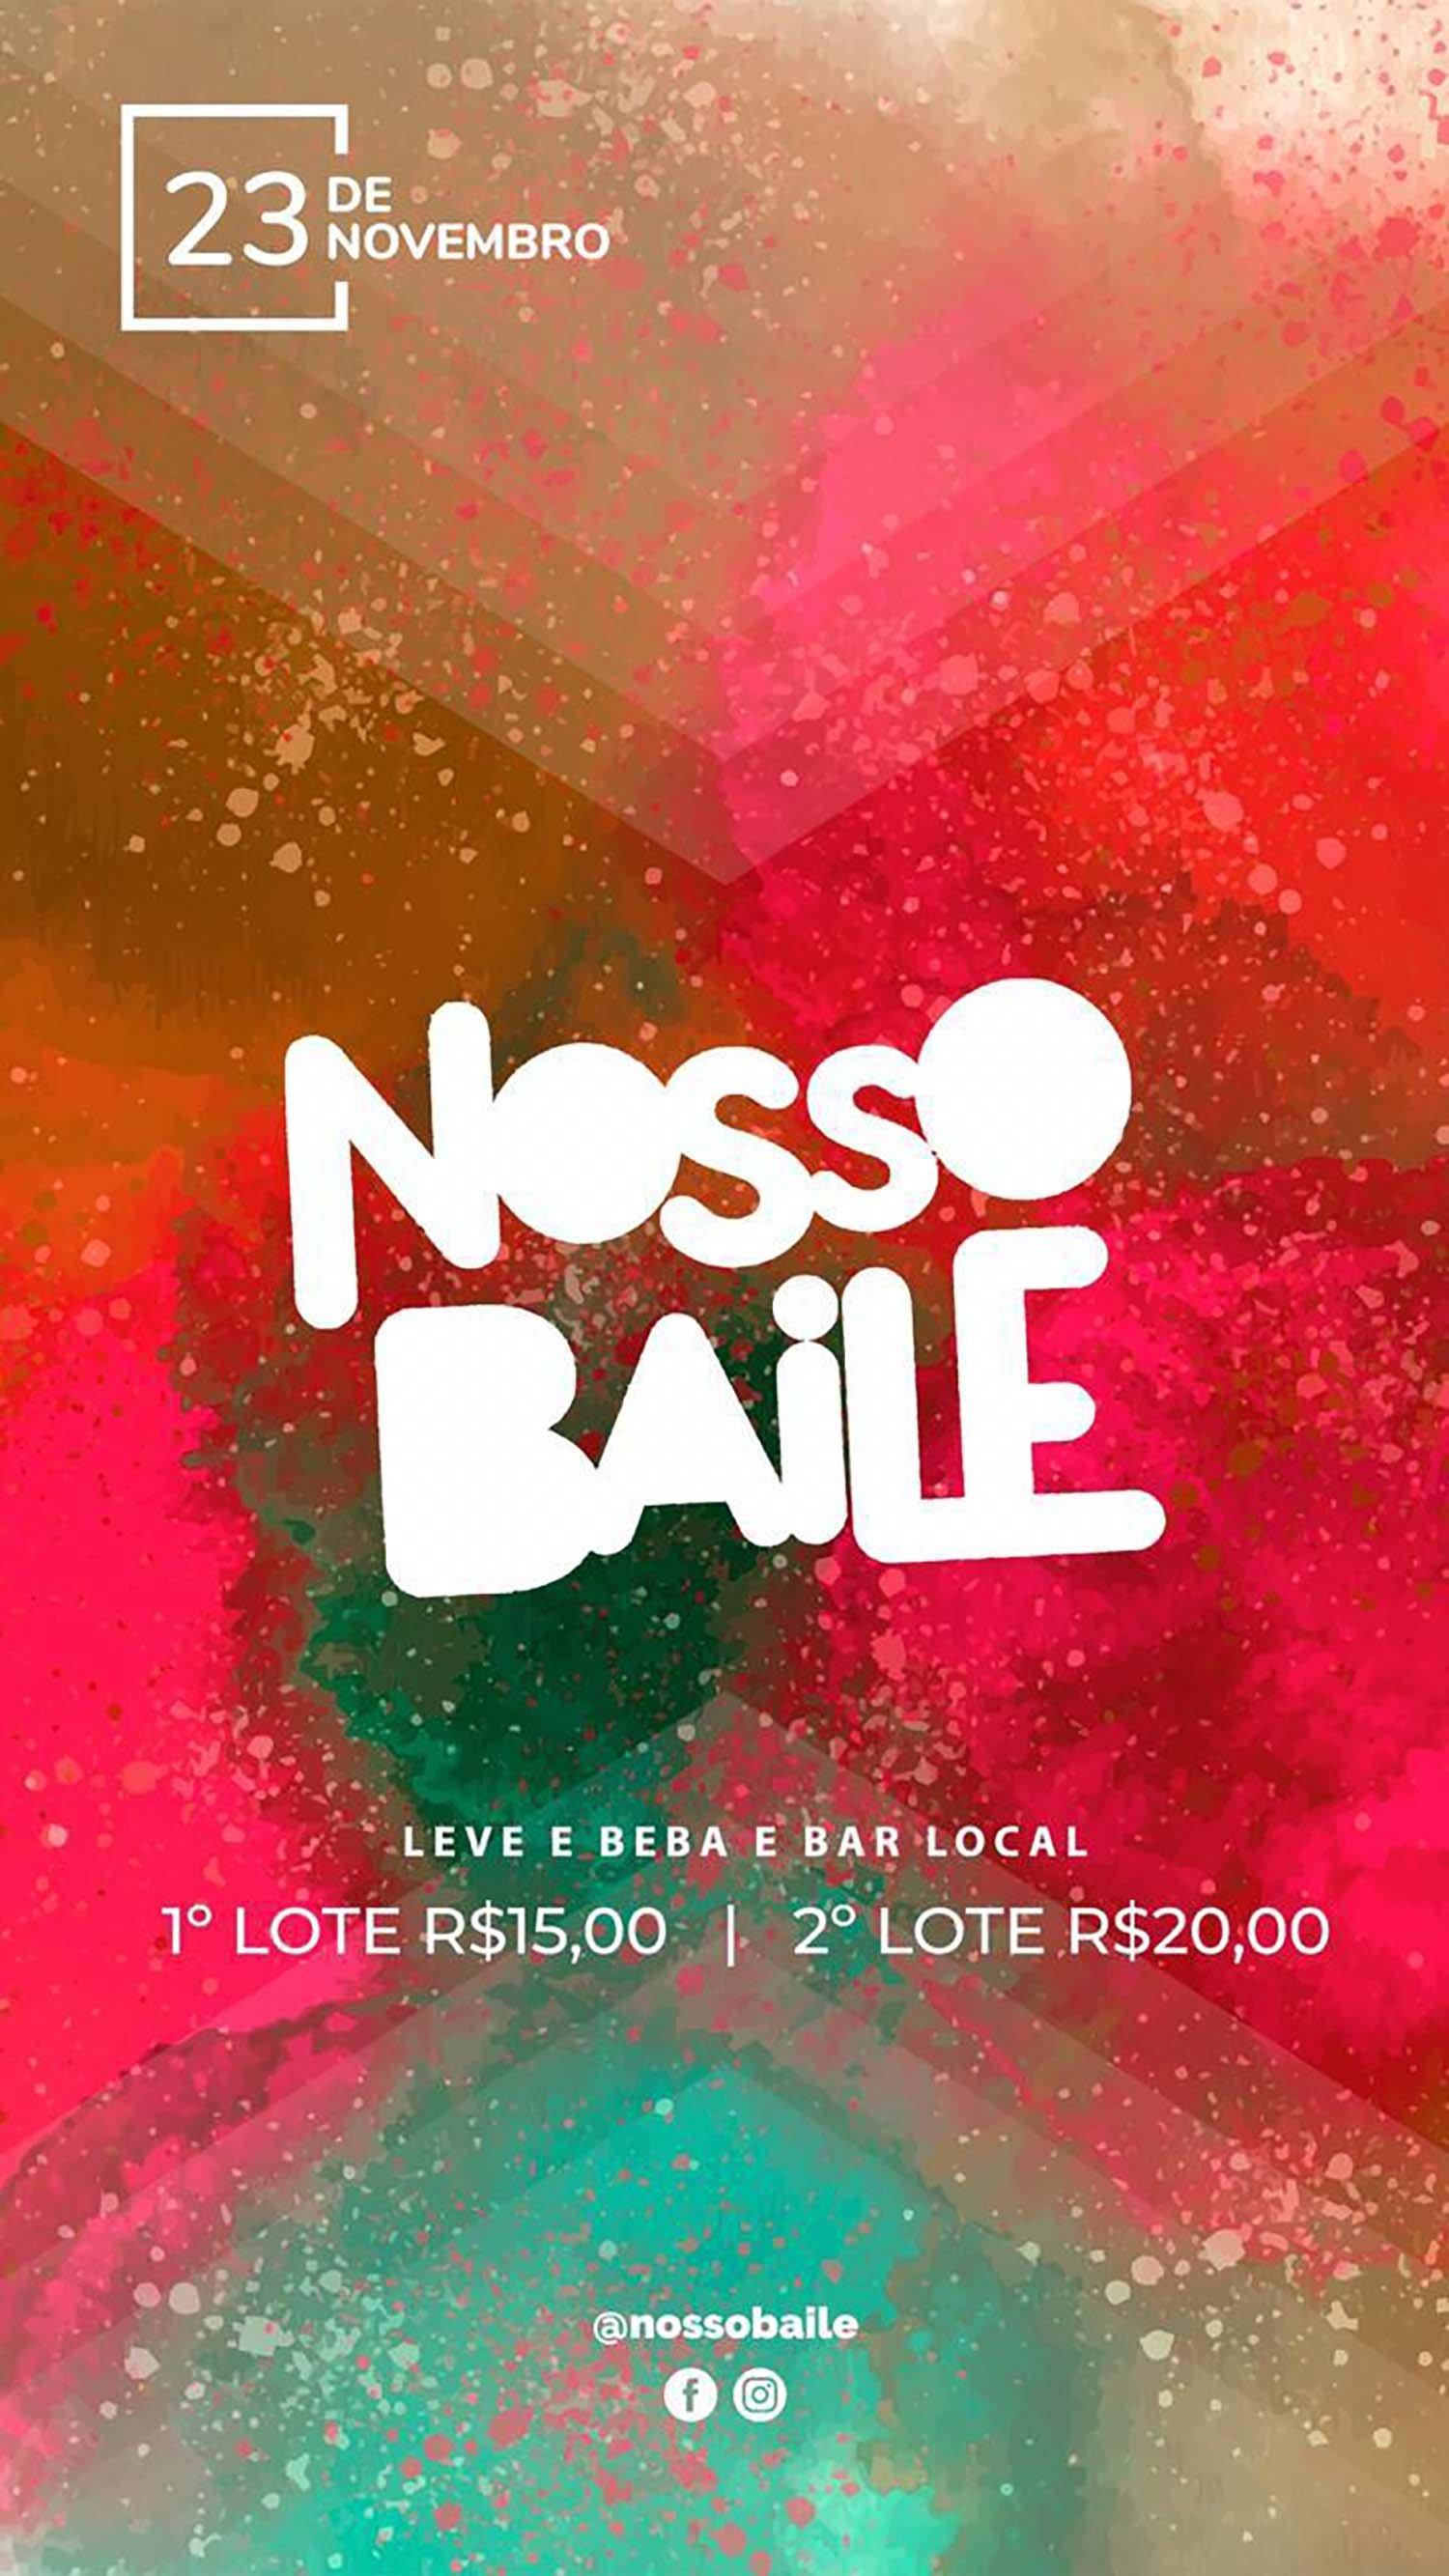 nosso-baile-23-11-2019